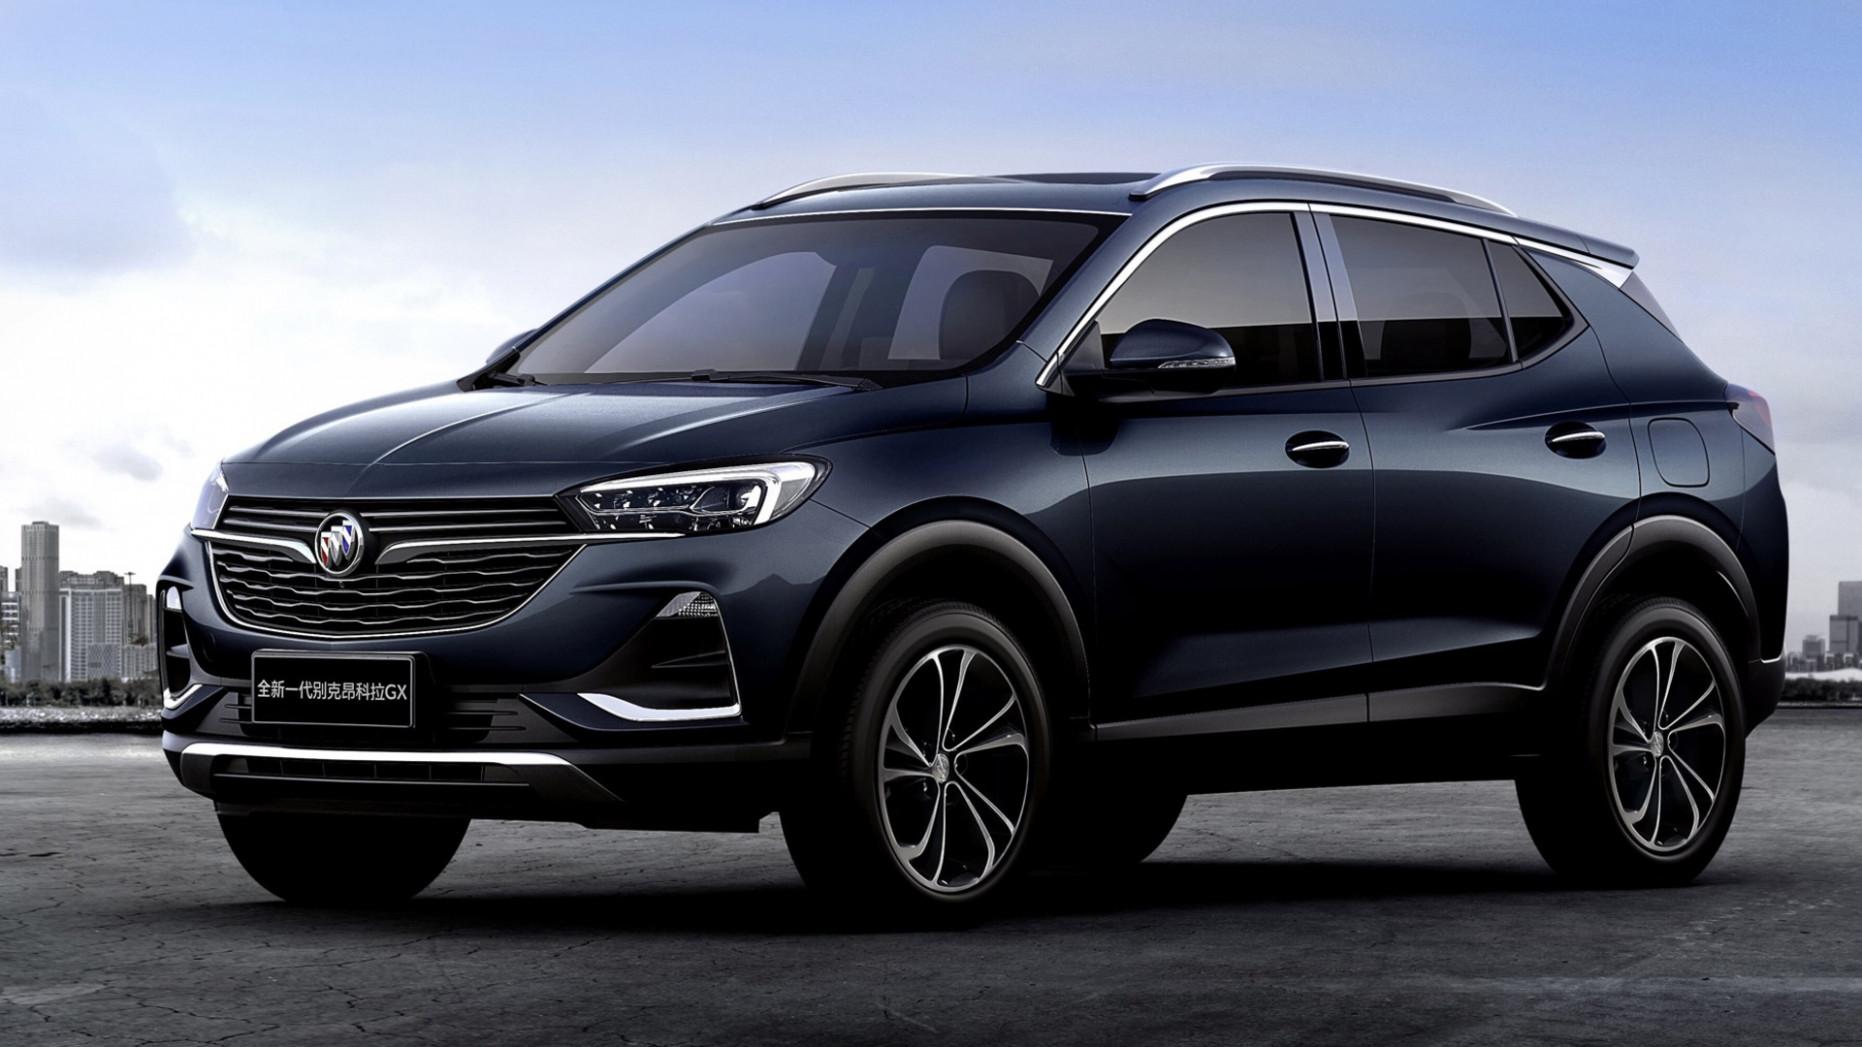 Rumors 2022 Buick Encore Shanghai